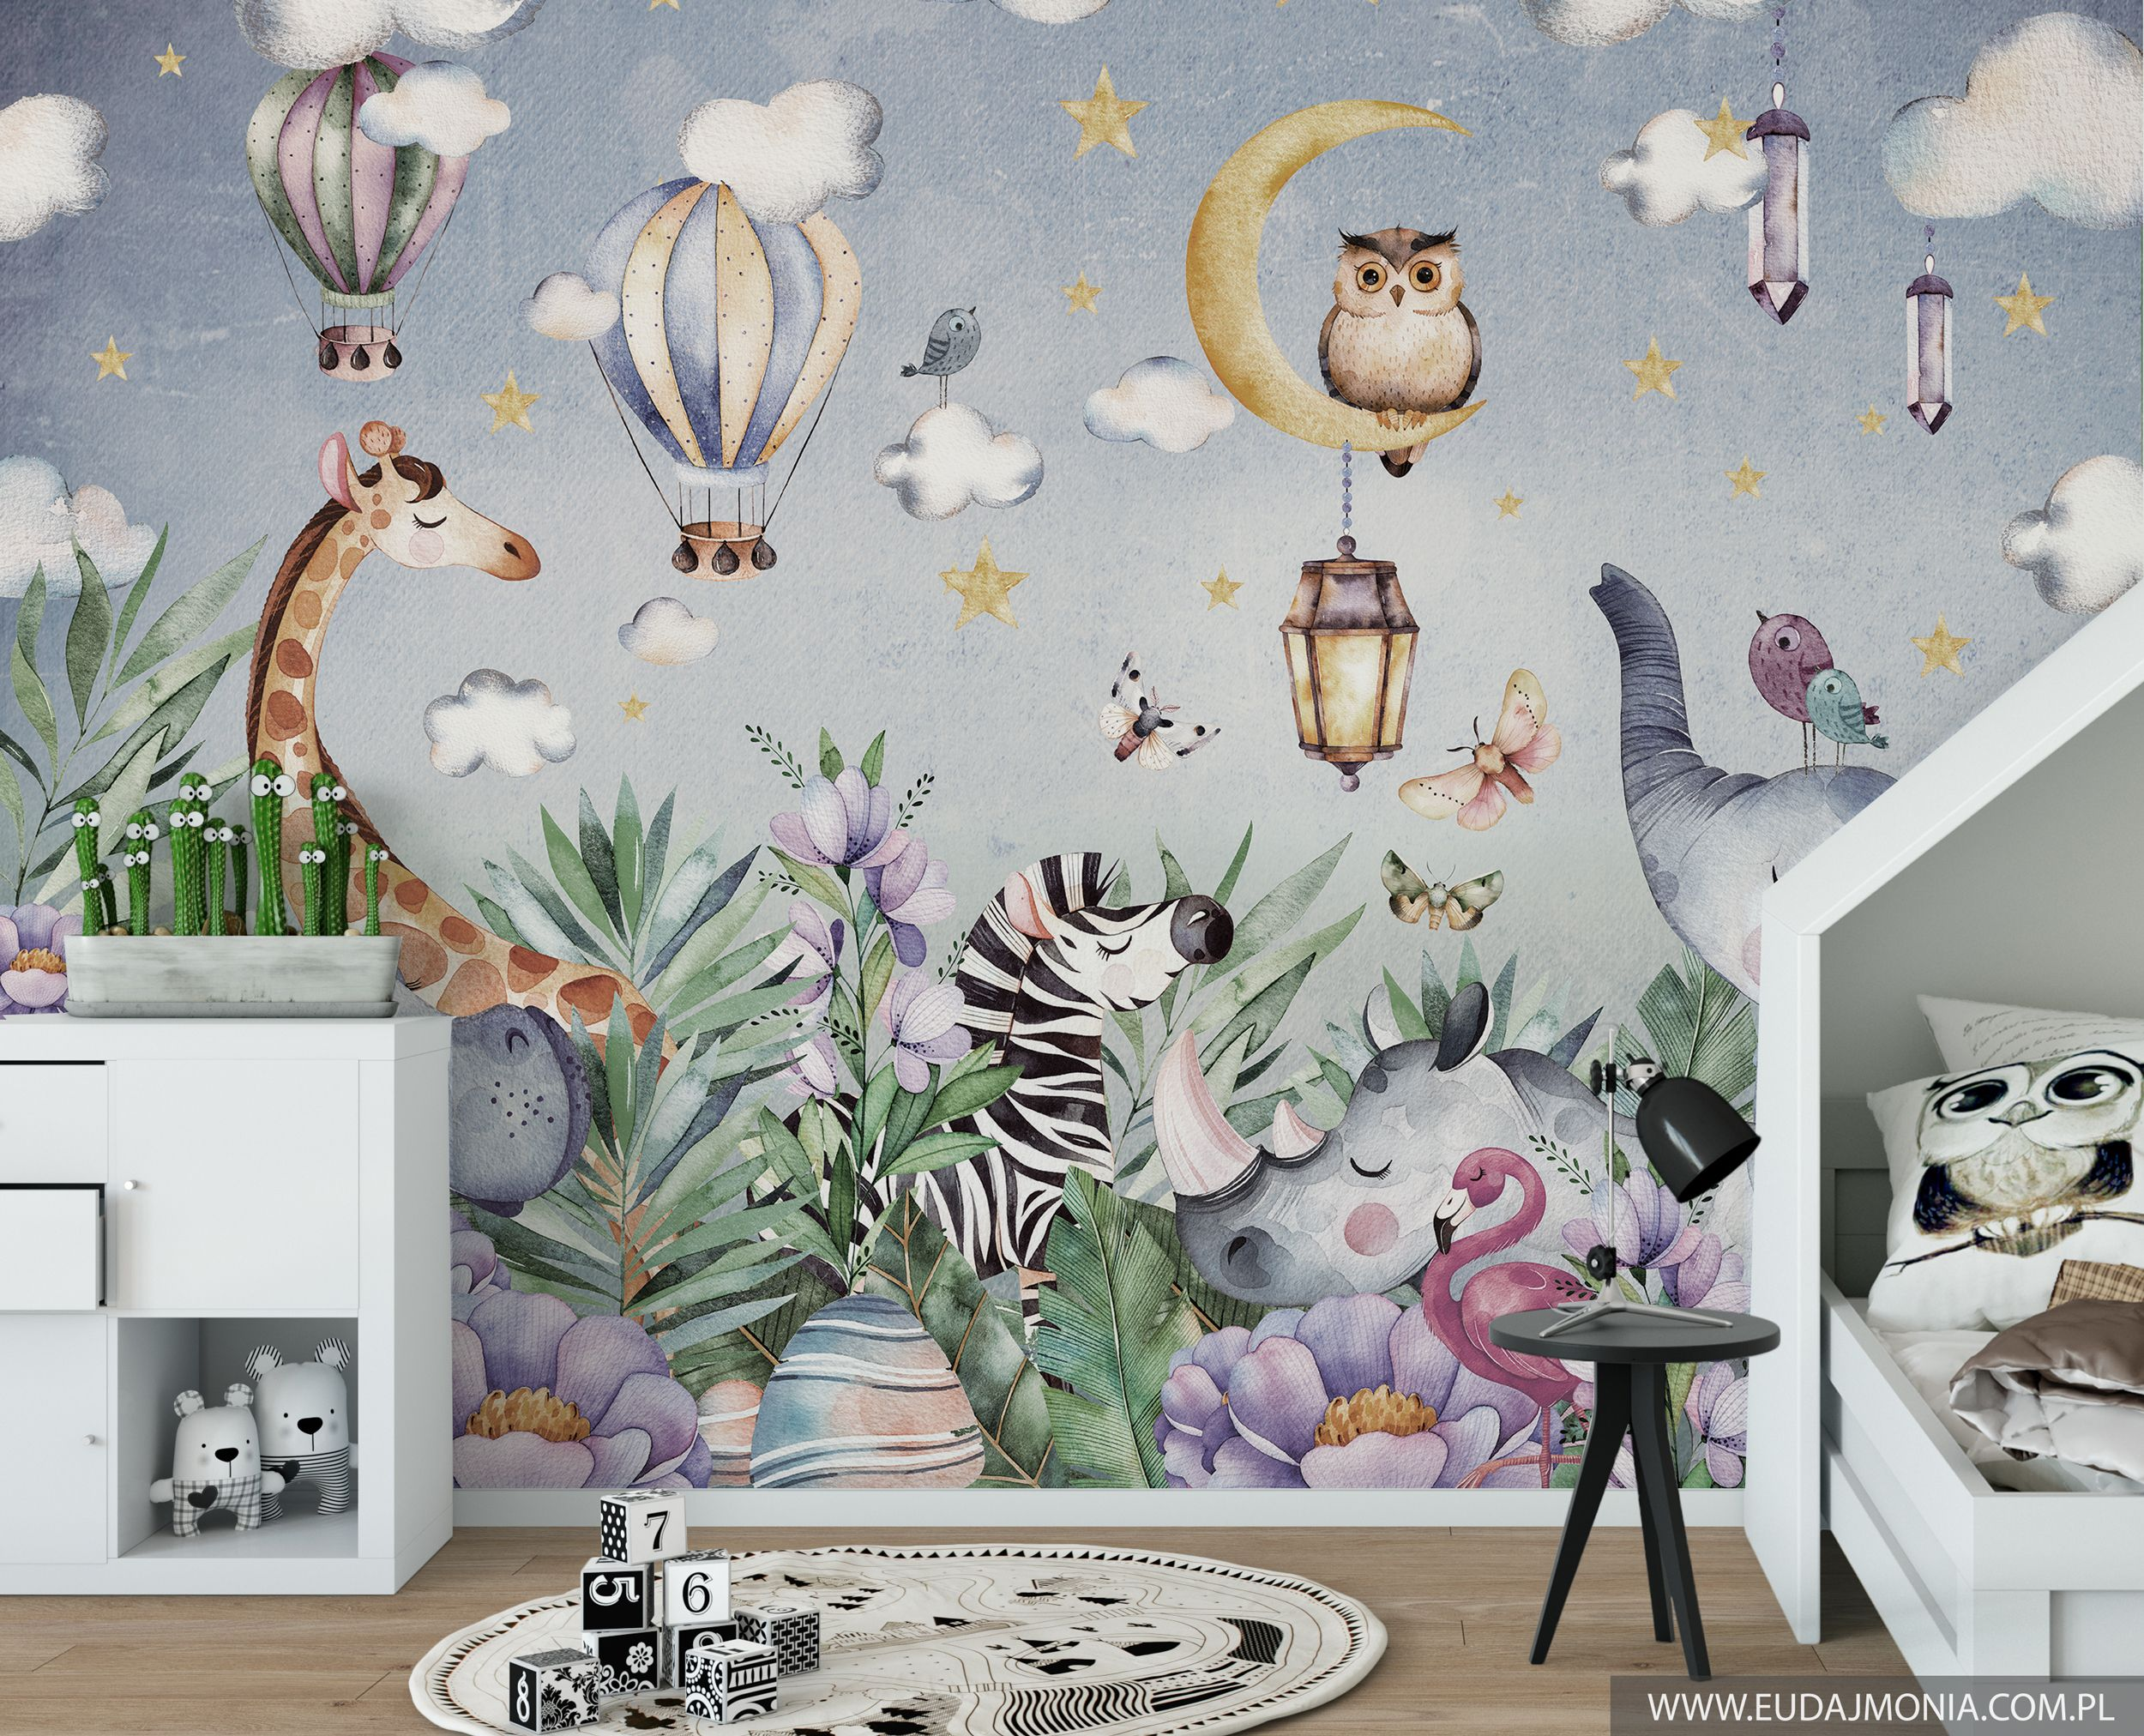 Jungle Wallpaper For Children With Animals Jungle Wallpaper